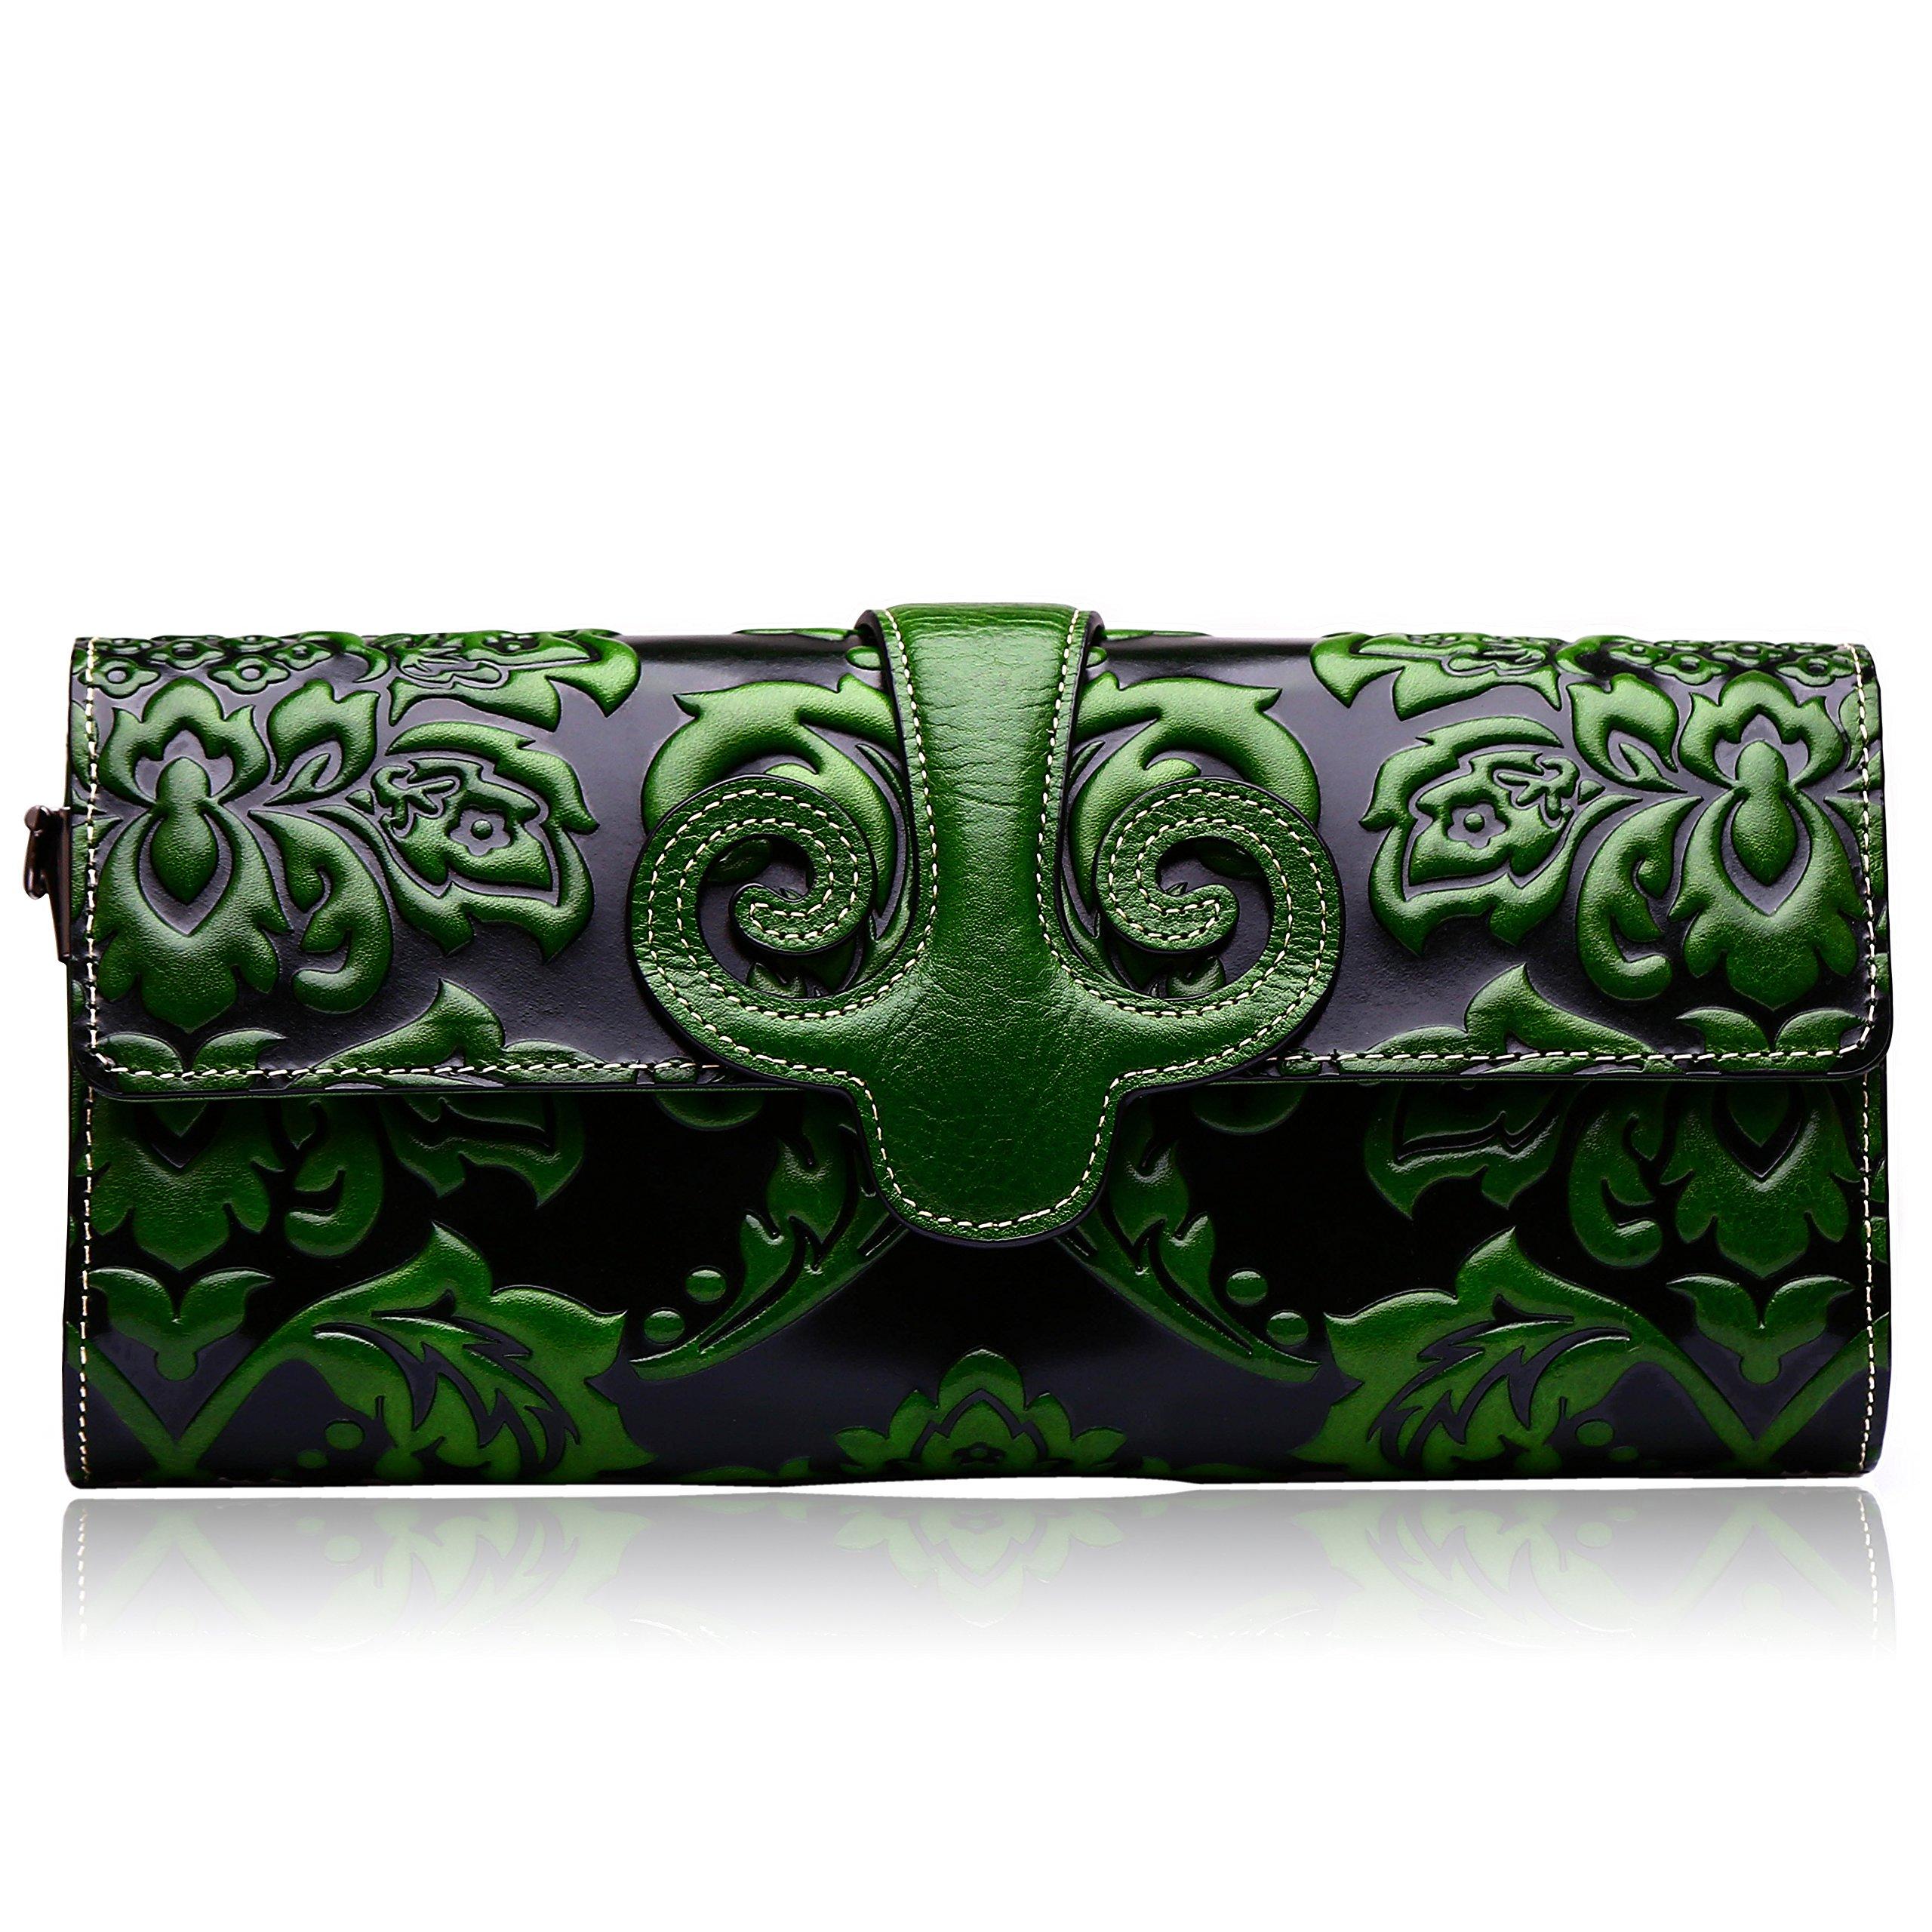 Naisibao Vintage Floral Artisan Leather Handmade Clutch Convertible Crossbody Designer Gift for Women